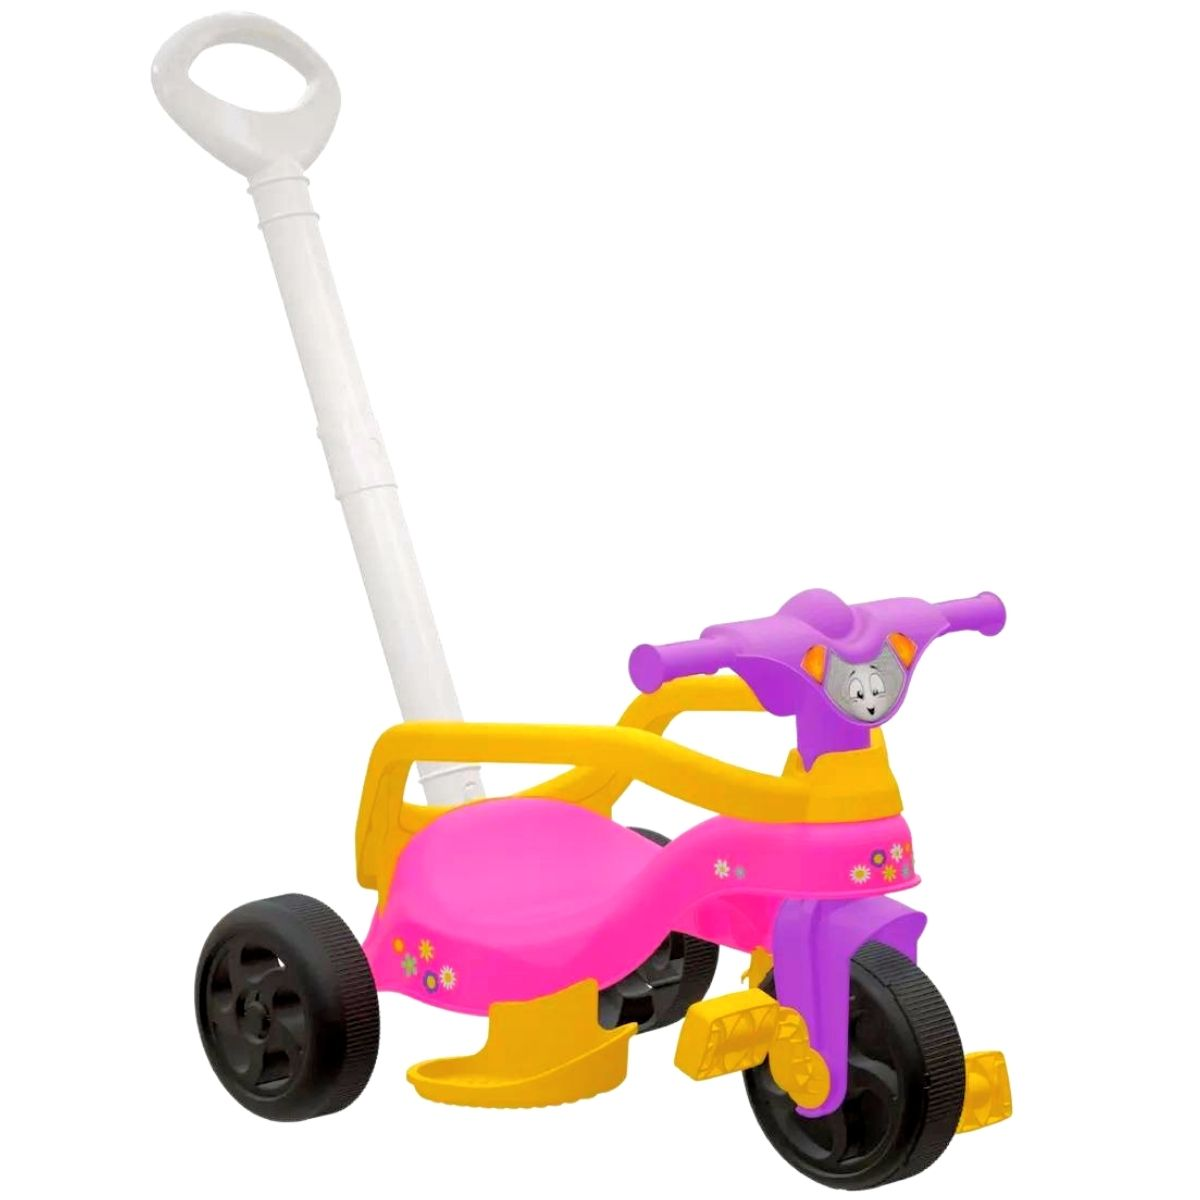 Triciclo Encantado Infantil Completo Haste Empurrar